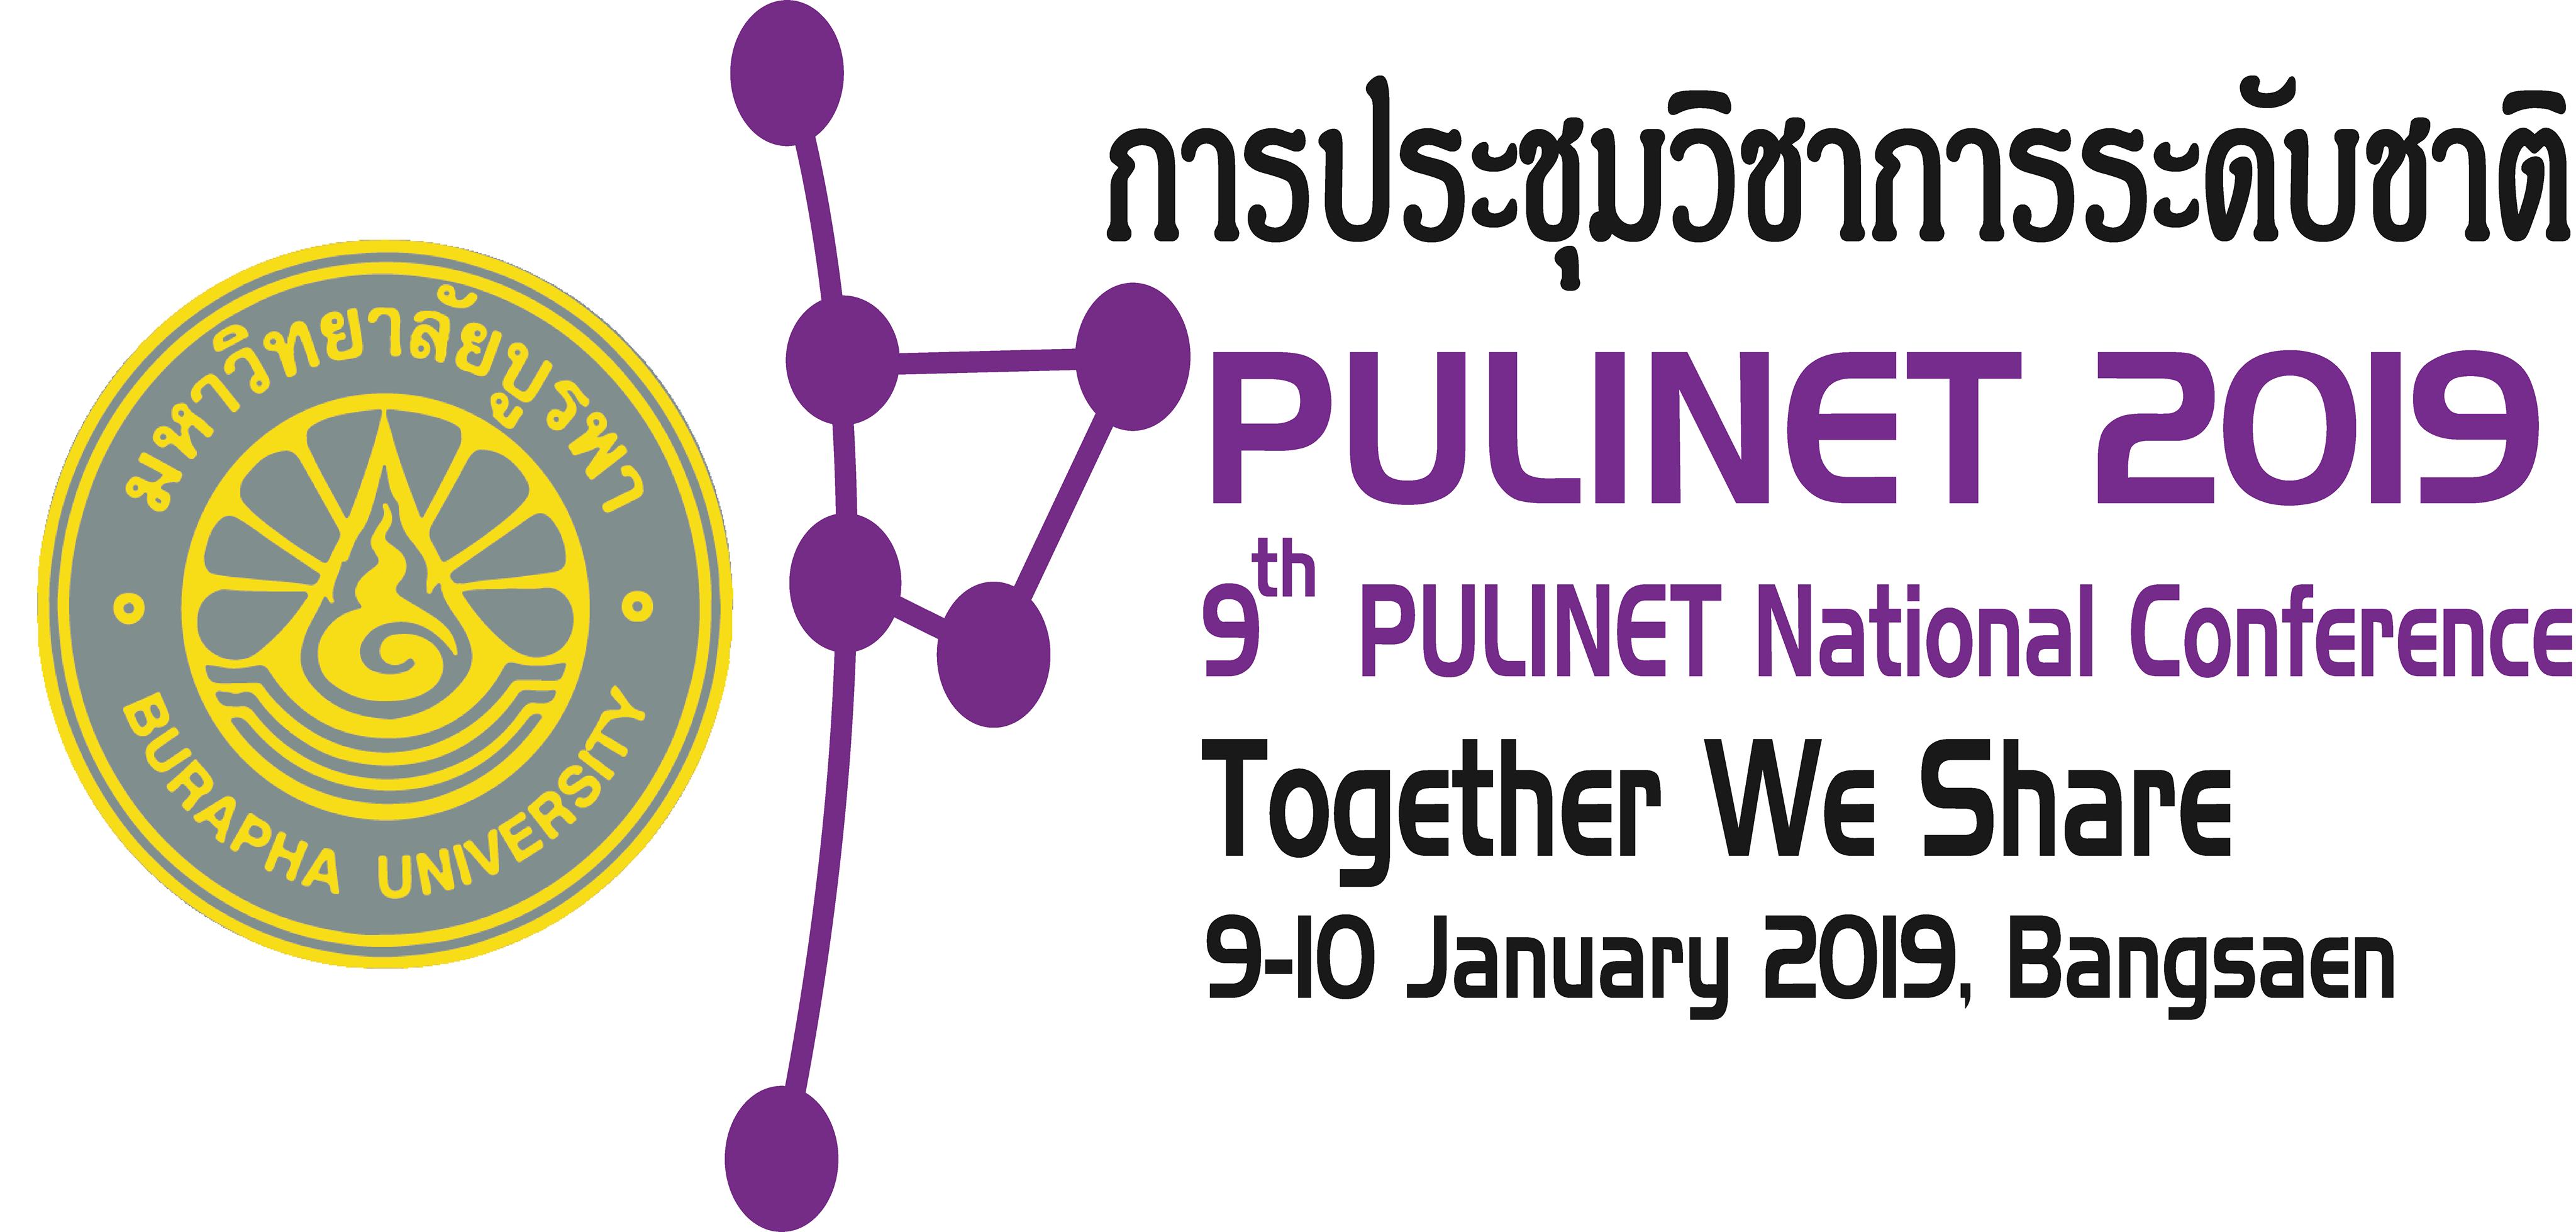 PULINET 2019